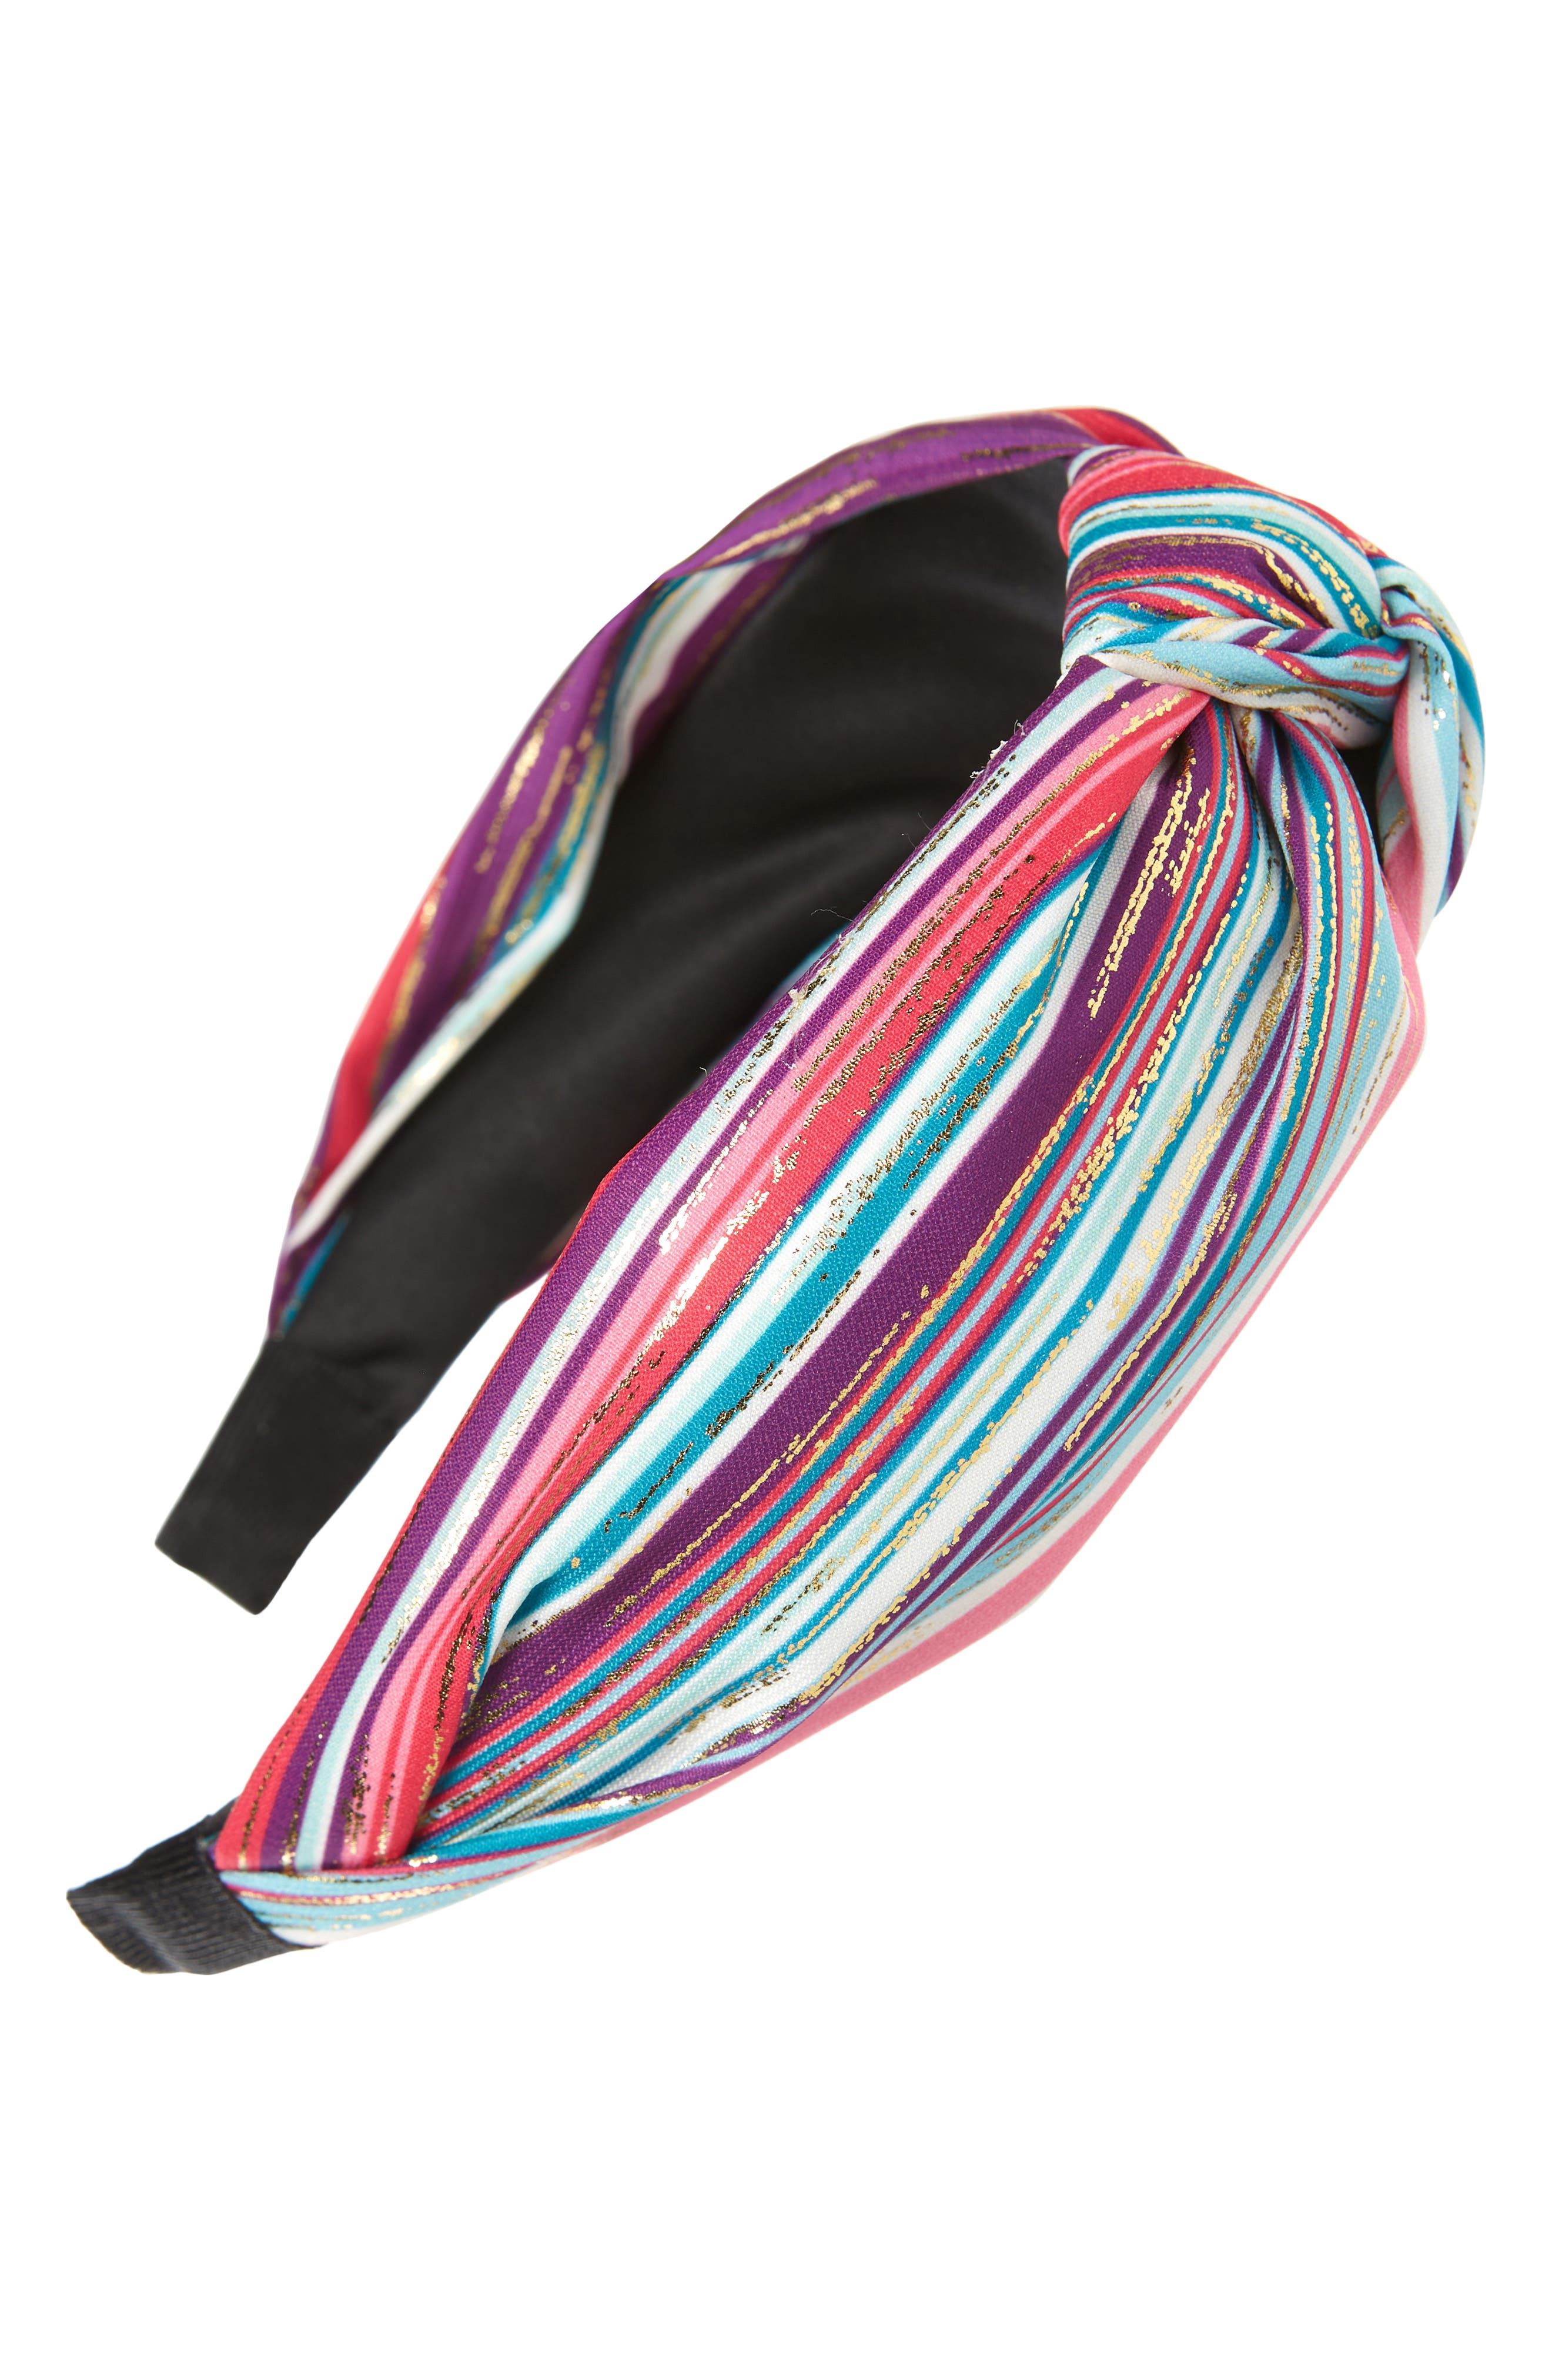 Details about  /Tasha Nordstrom Headband Flower Fabric Peach White Soft Head Kid Wrap $28 NEW